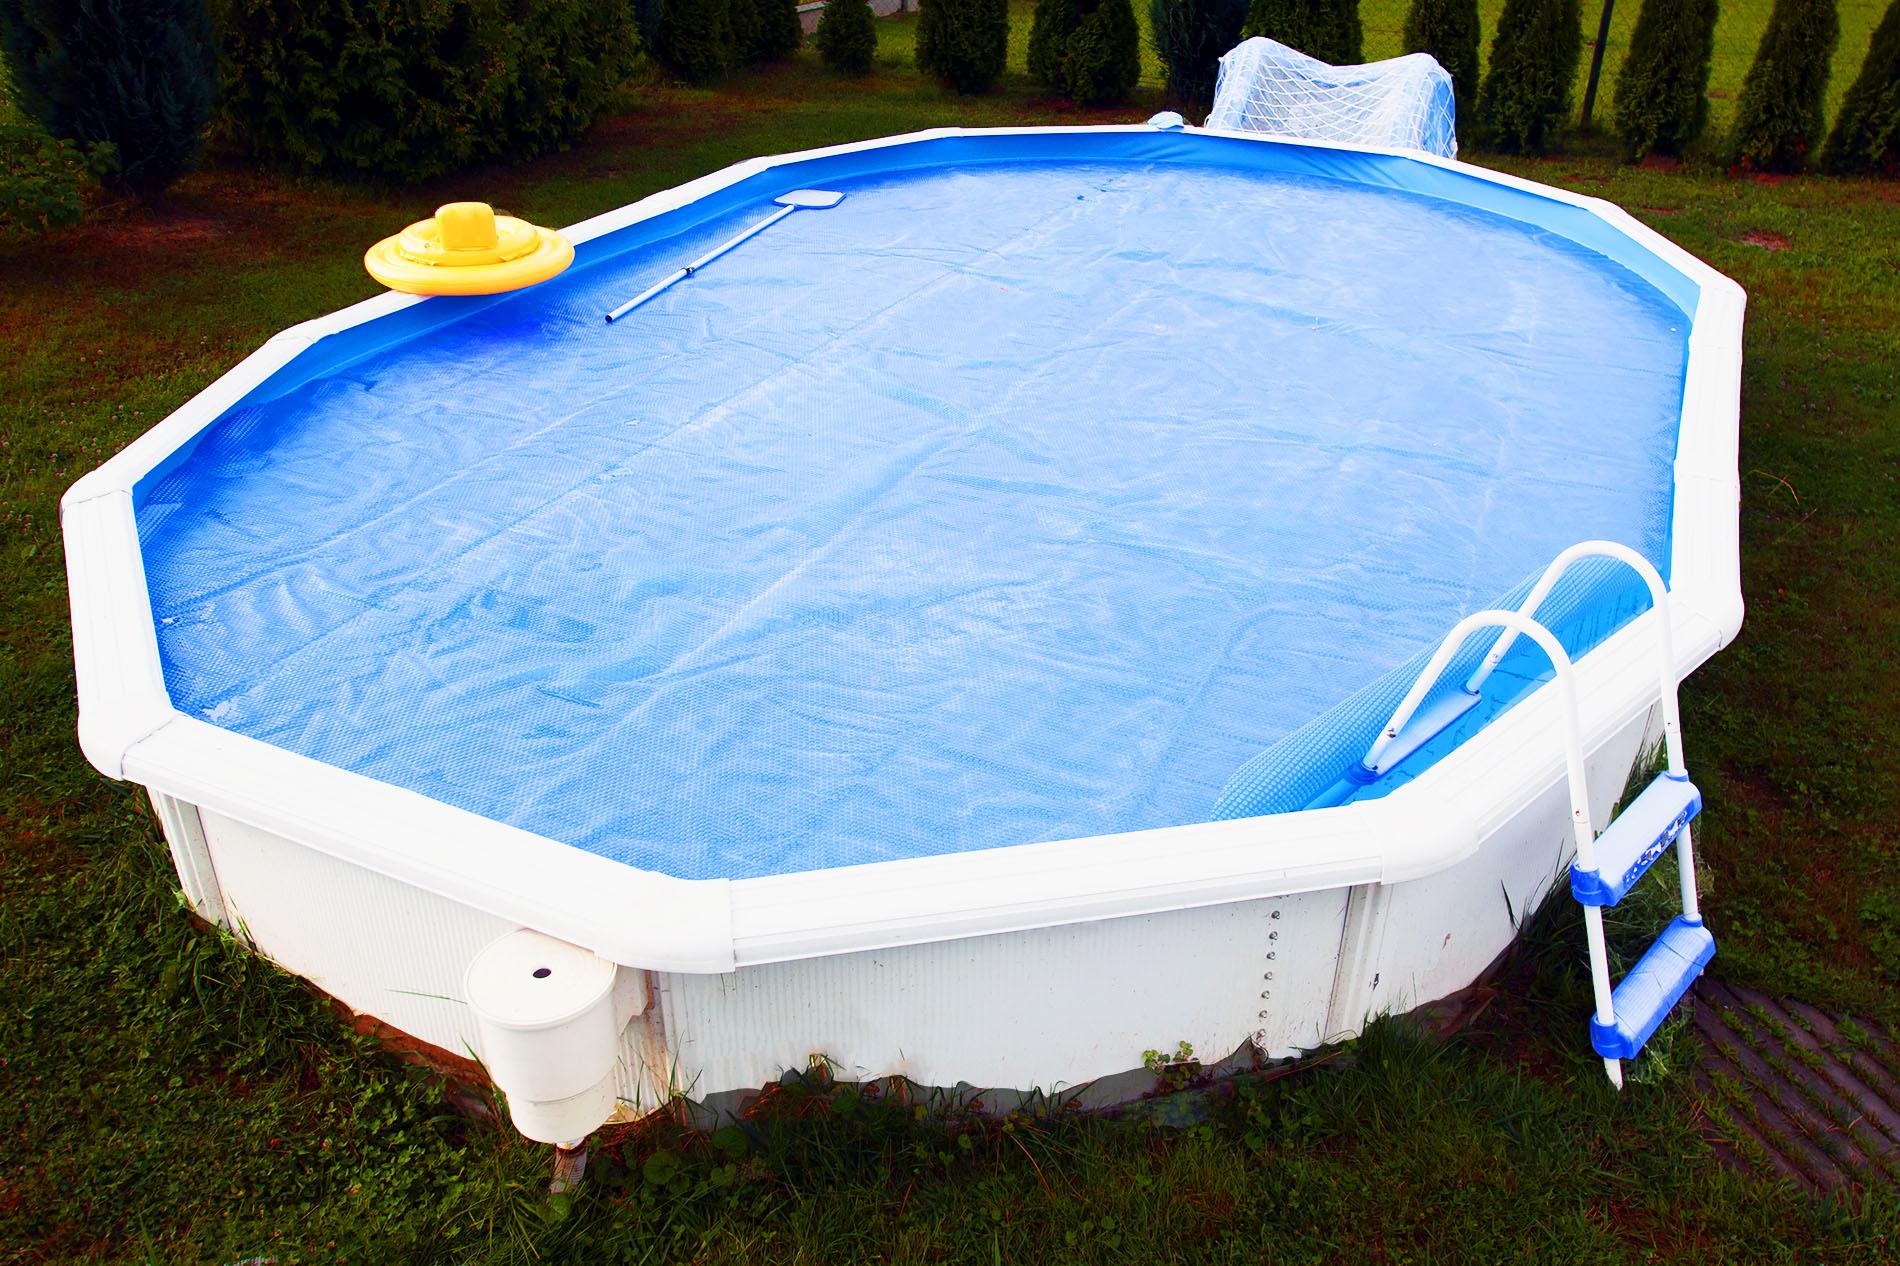 aboveground-pool-closing-liner